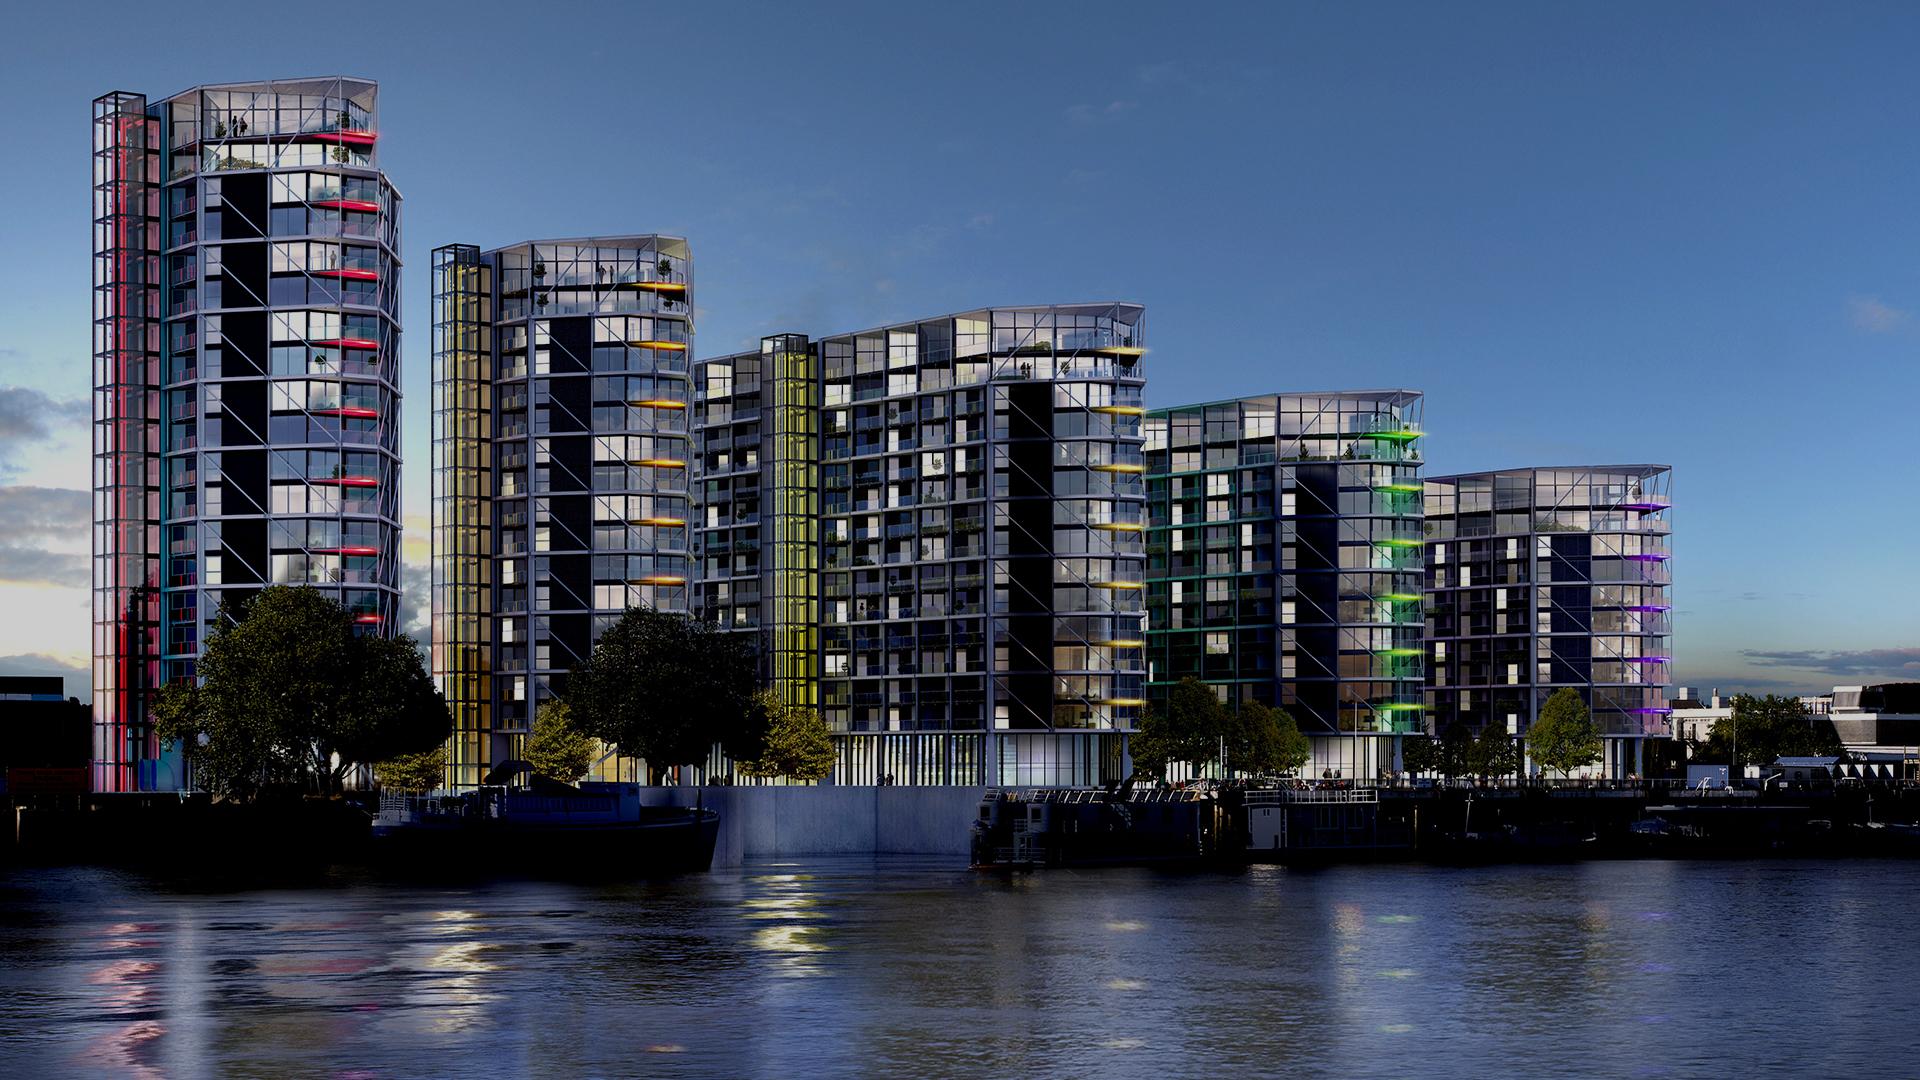 Riverlight, London